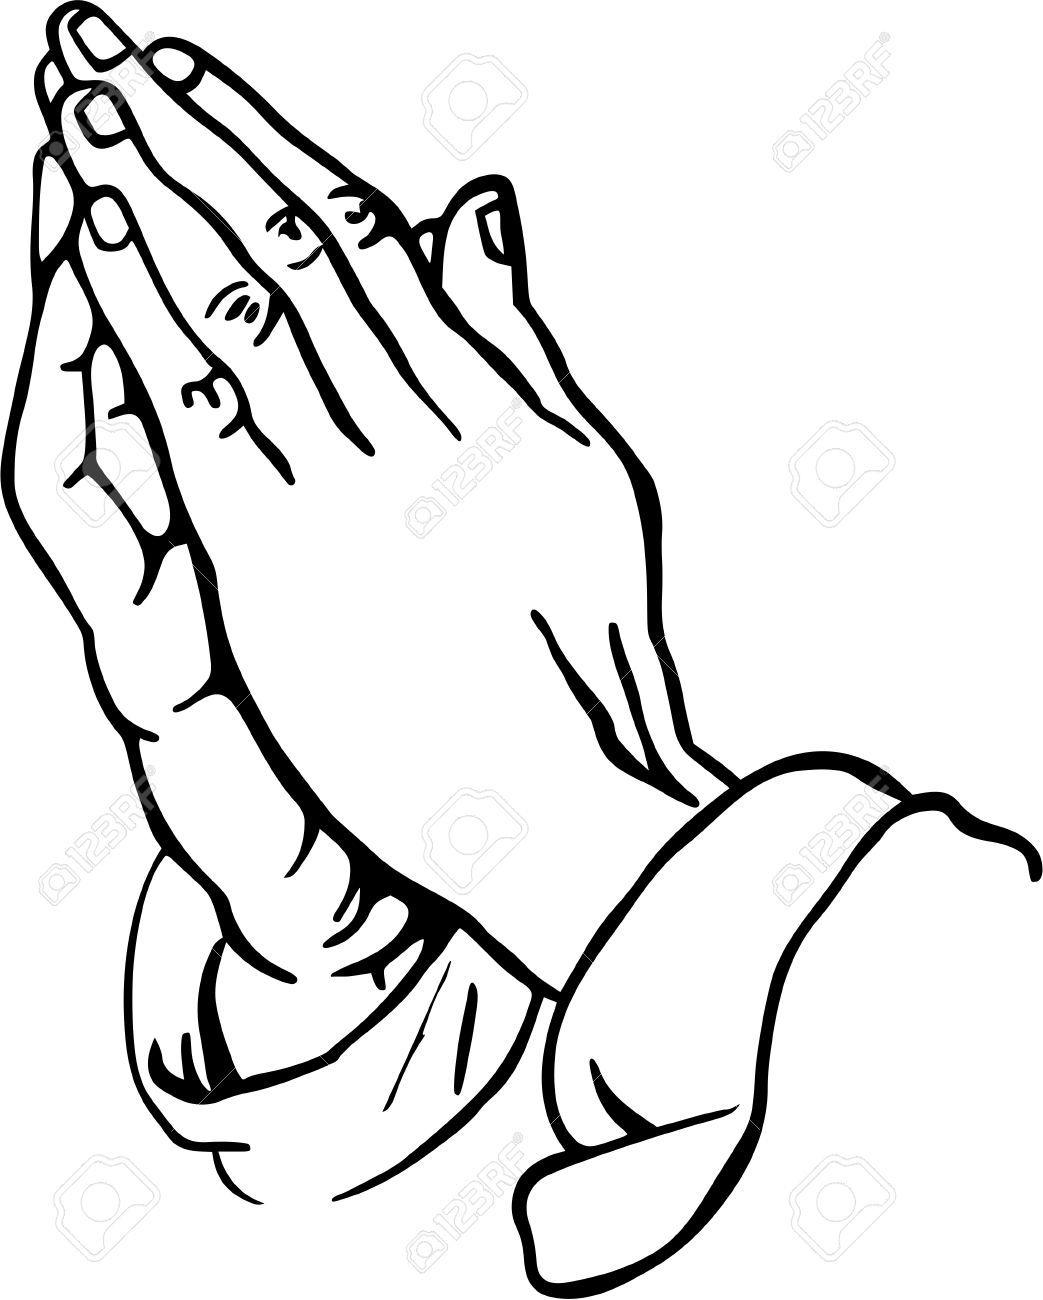 1043x1300 How To Draw Praying Hands Emoji Praying Hands Clipart Craft